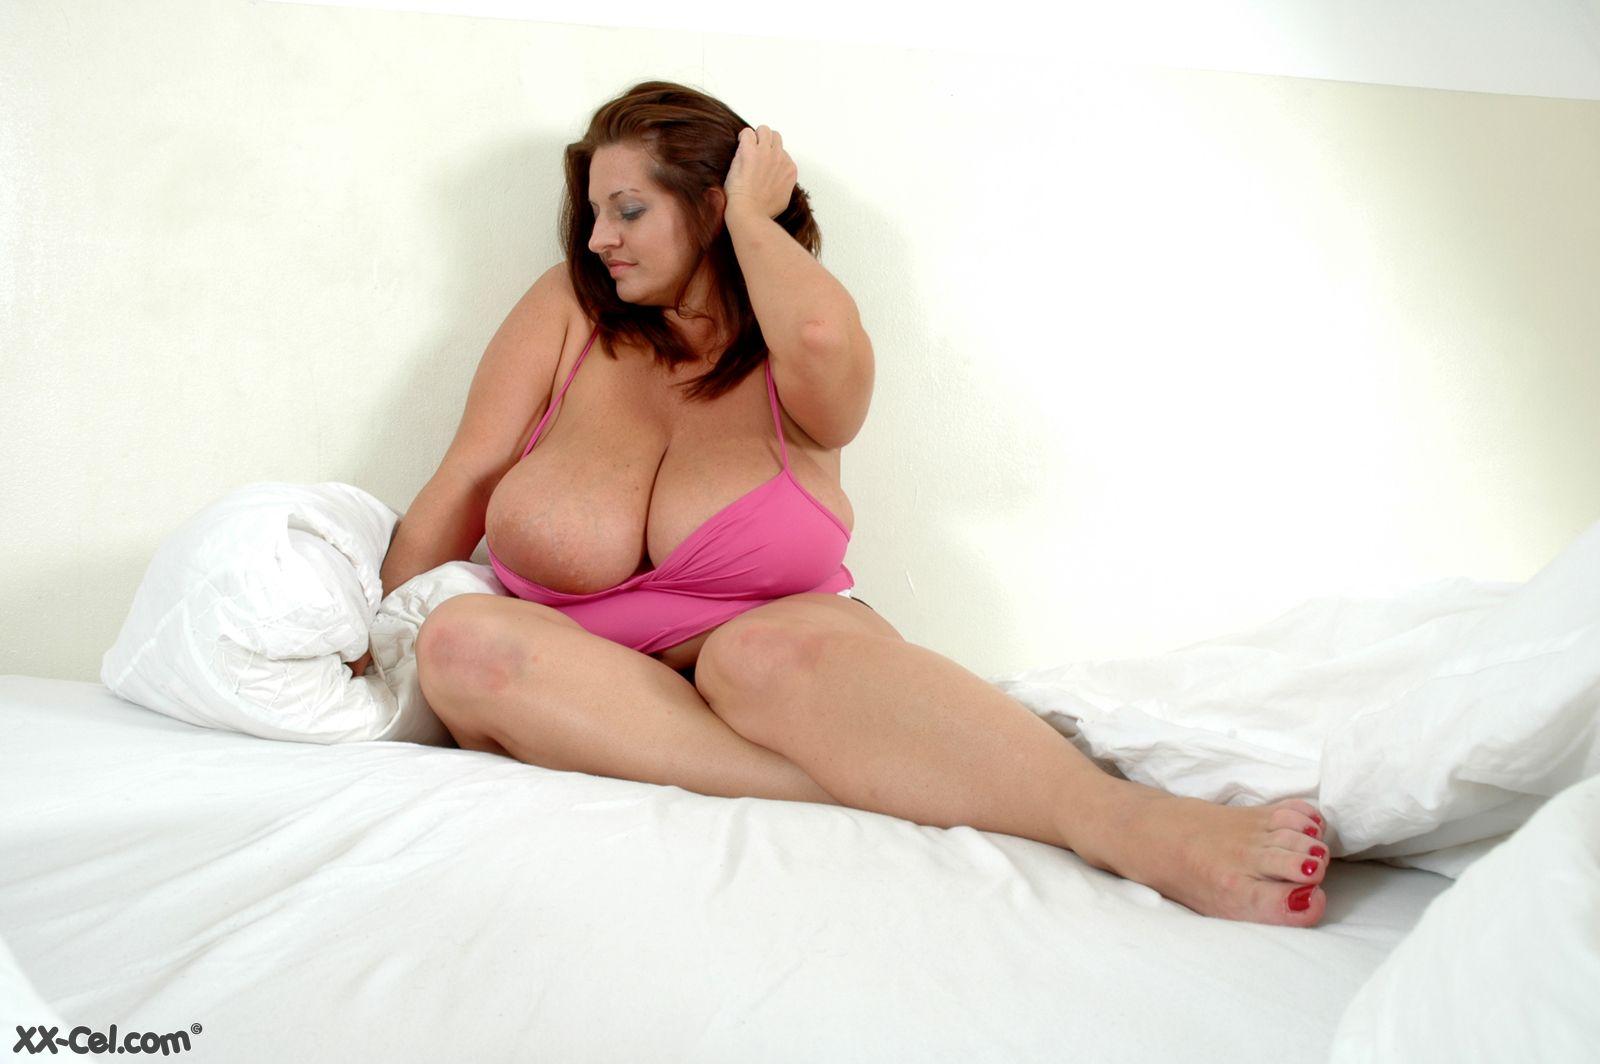 gifs boobs squeeze sex hard porn